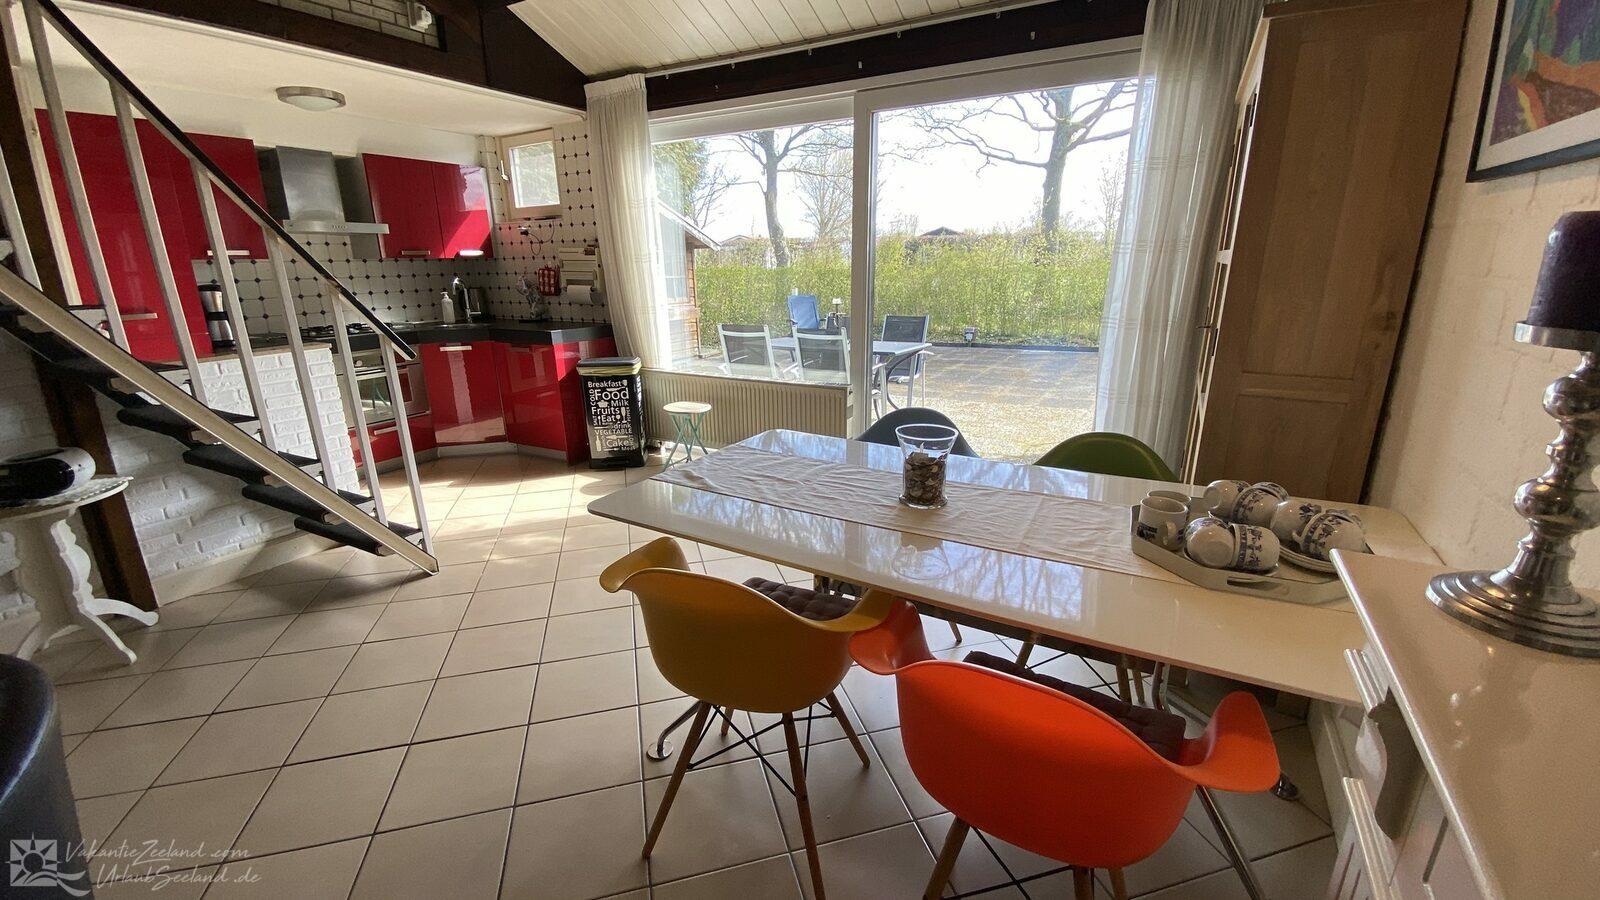 VZ992 Holiday home in Ellemeet